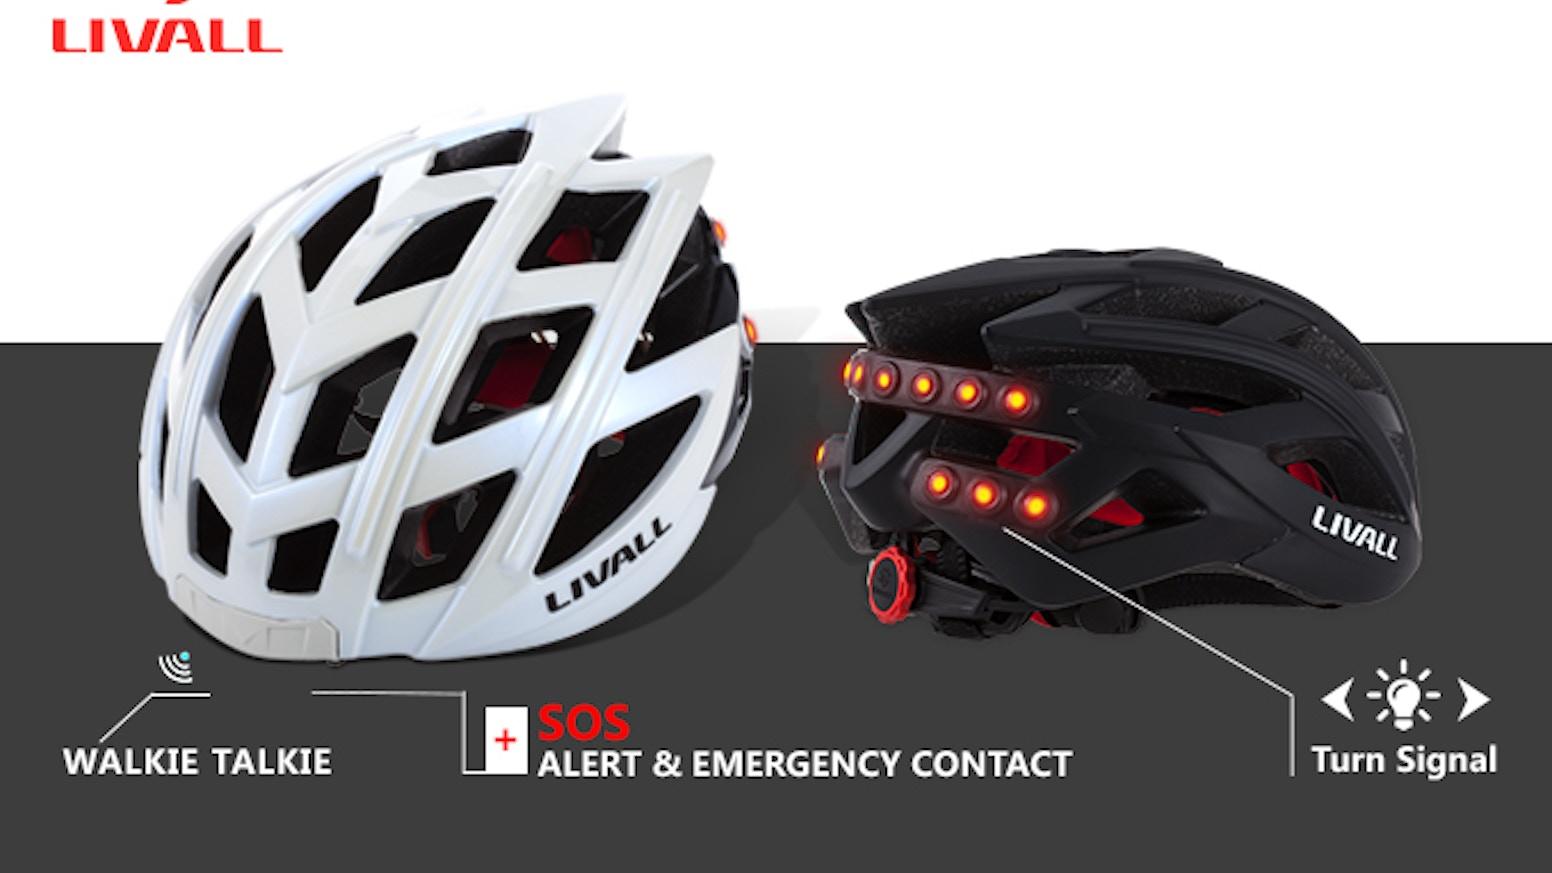 Smart and Safe Bike Helmet = Turn Signal + SOS Alert + Phone Calls + Music Player+Walkie-Talkie